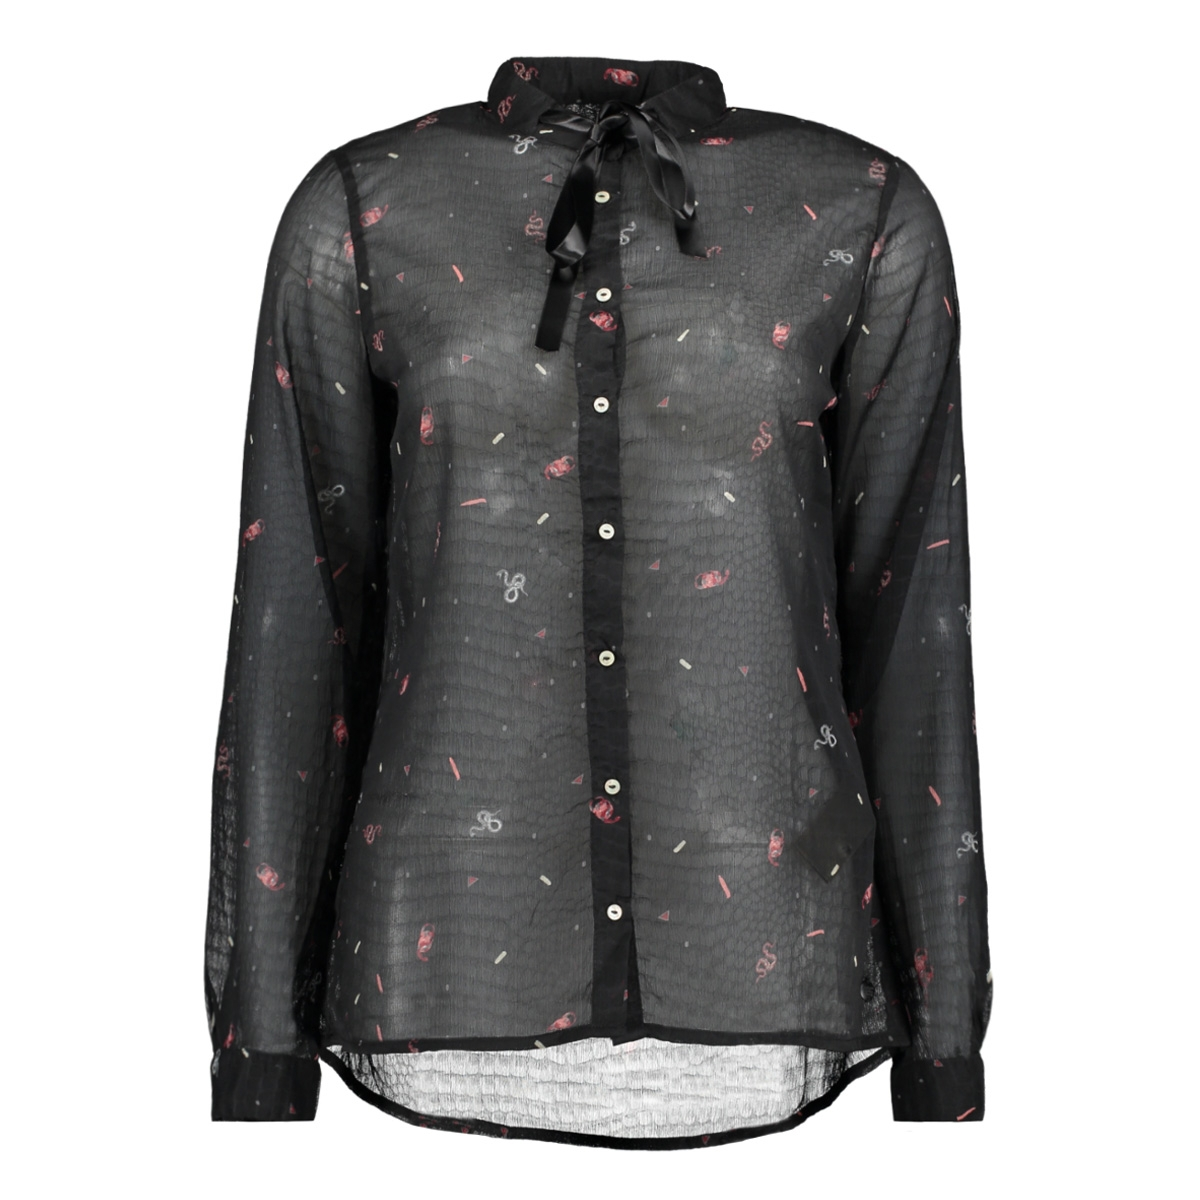 h70230 garcia blouse 60 black